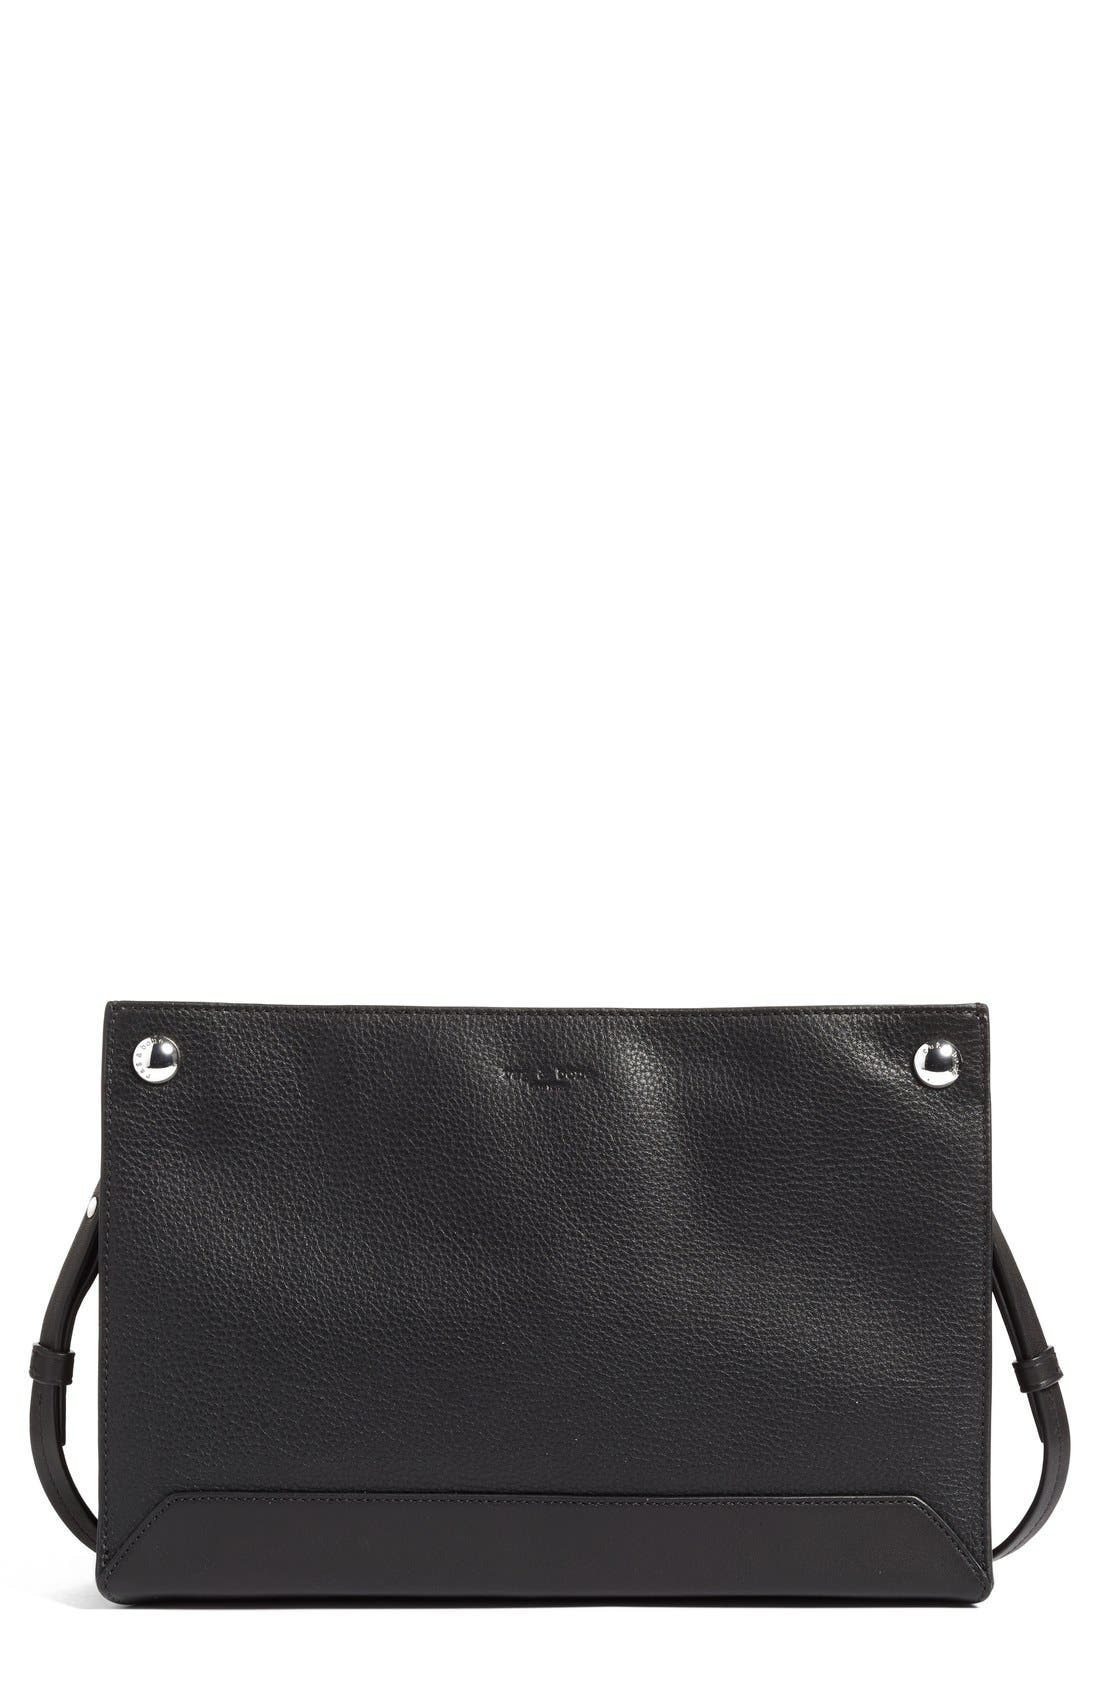 Compass Leather Crossbody Bag,                         Main,                         color, BLACK